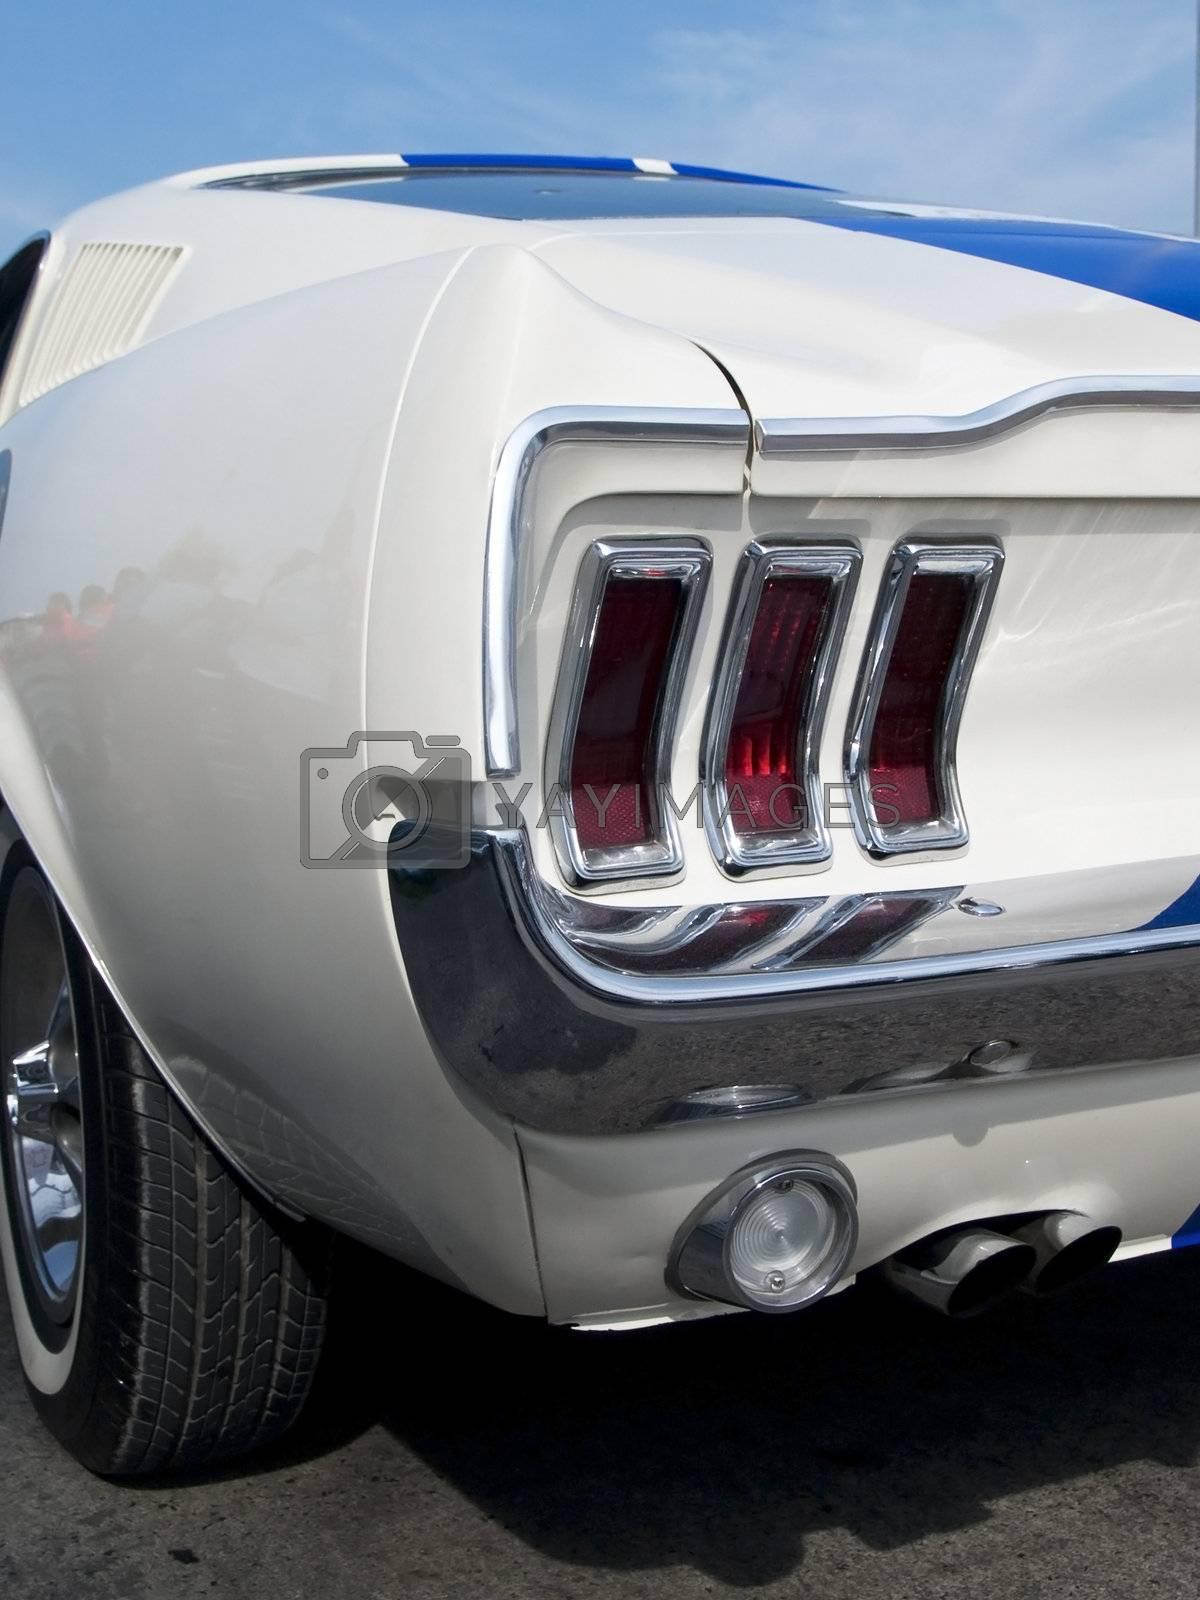 Detail of American sportscar by epixx